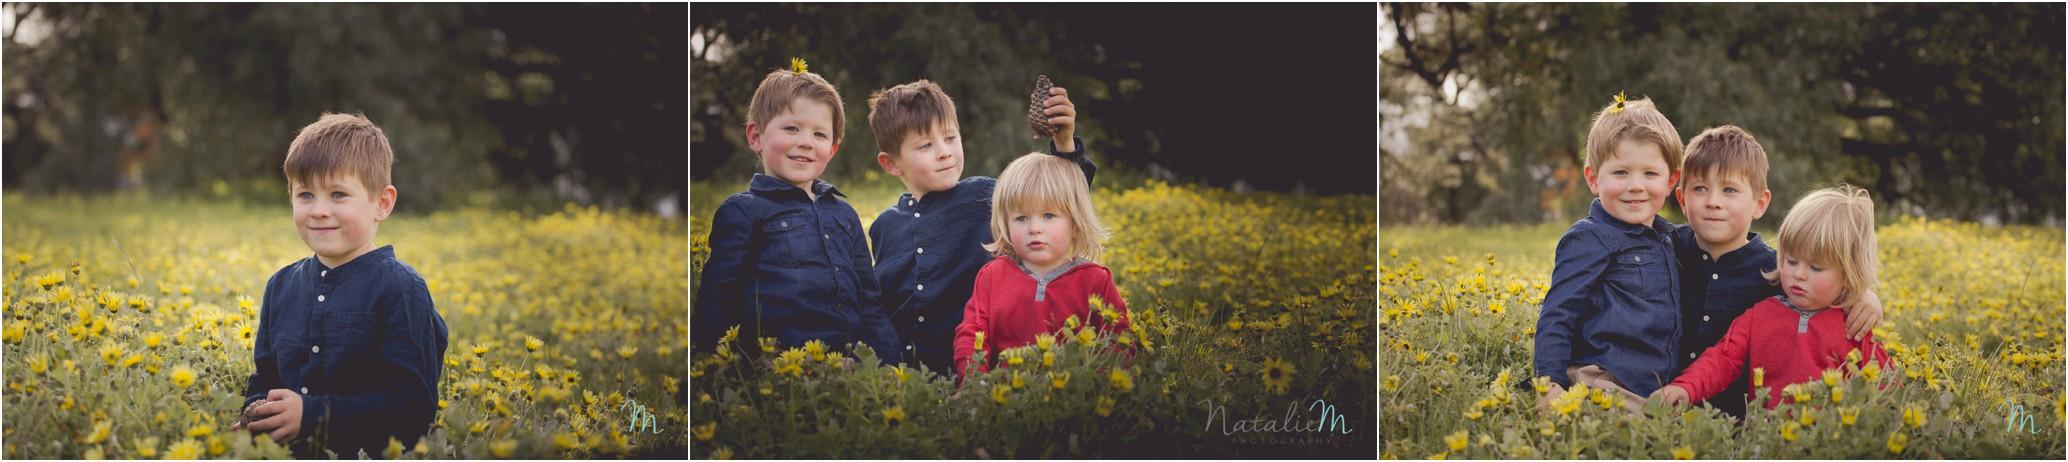 newborn-photography-geelong_0678